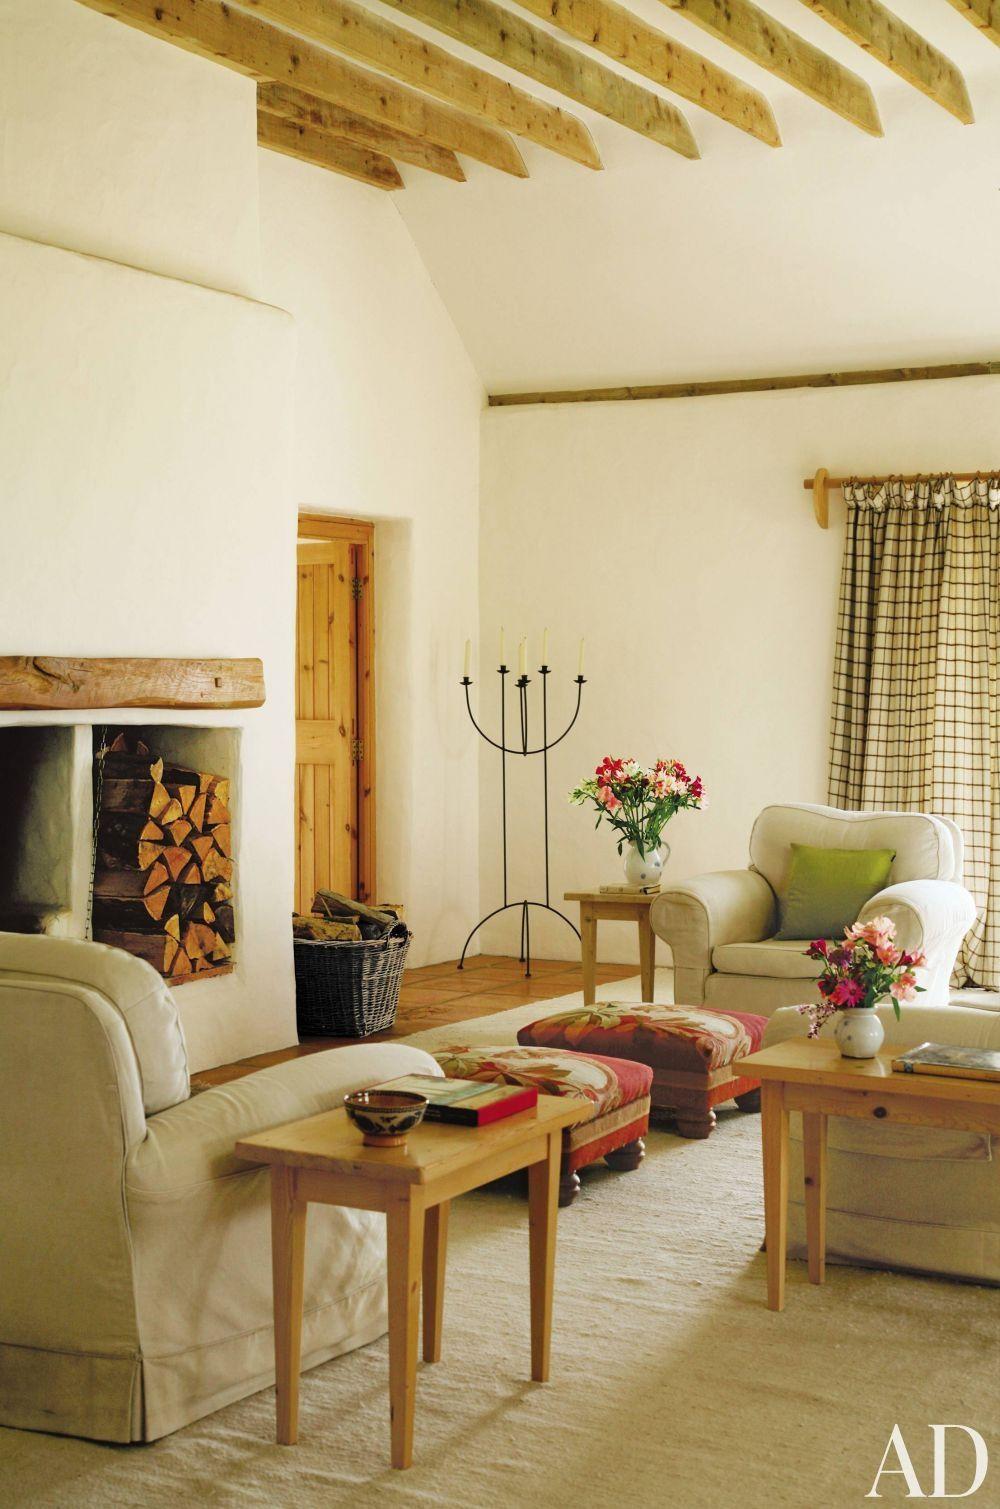 rustic living room in county cork ireland  rustic living